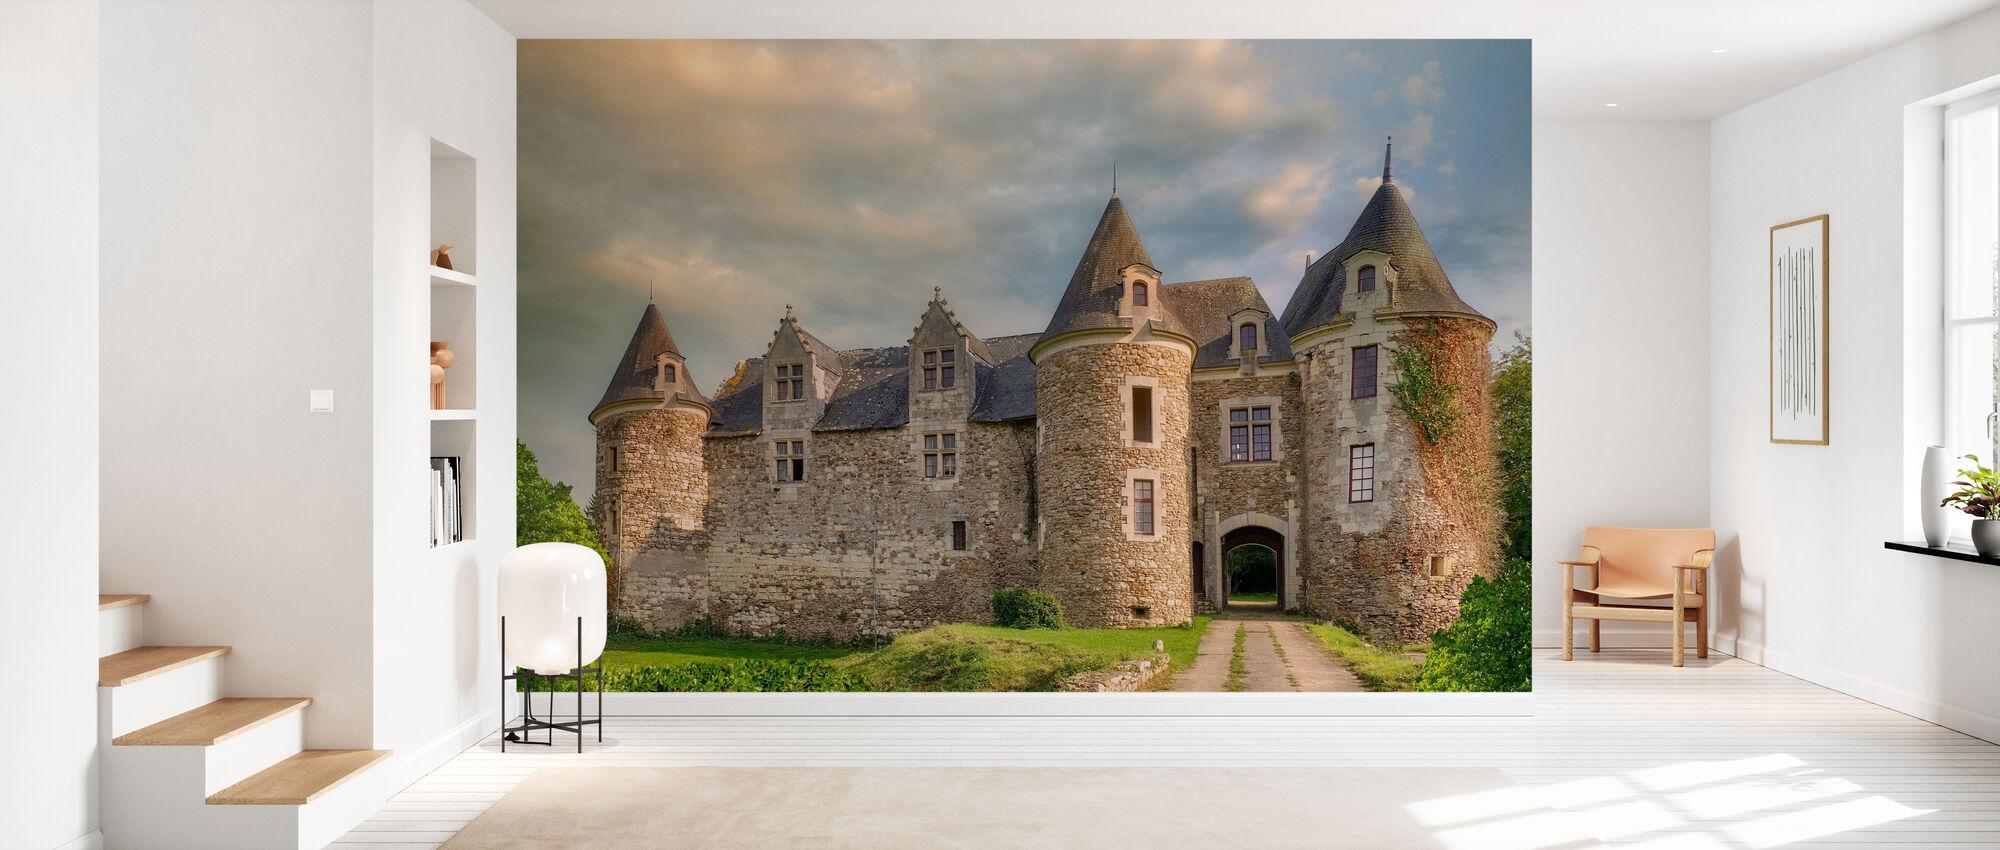 Countryside Castle - Wallpaper - Hallway